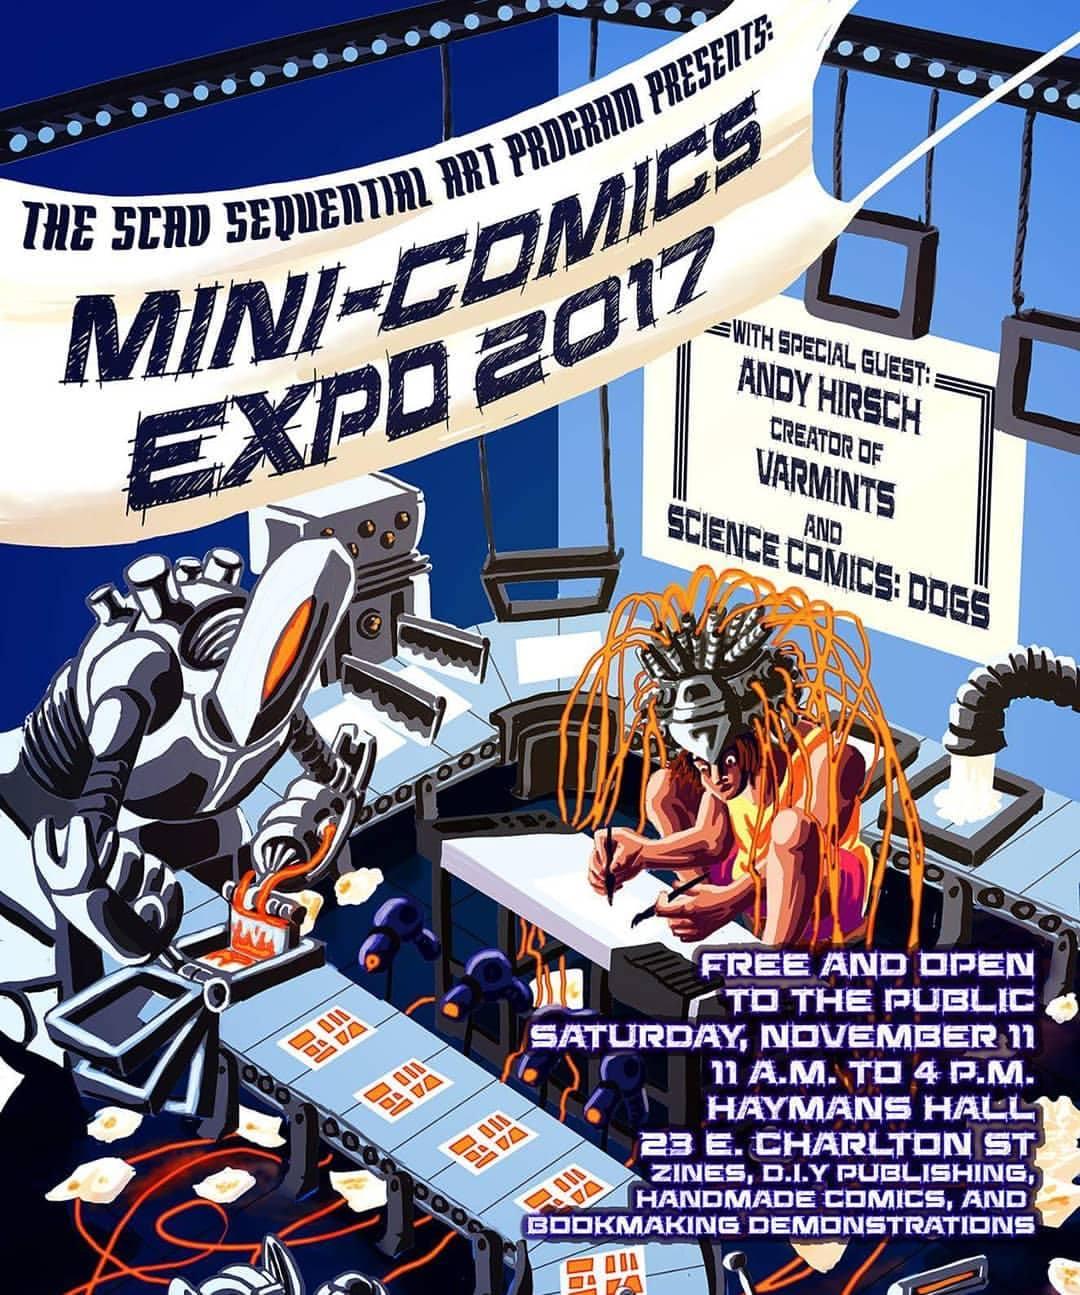 SCAD Mini-Comics Expo 2017 Poster